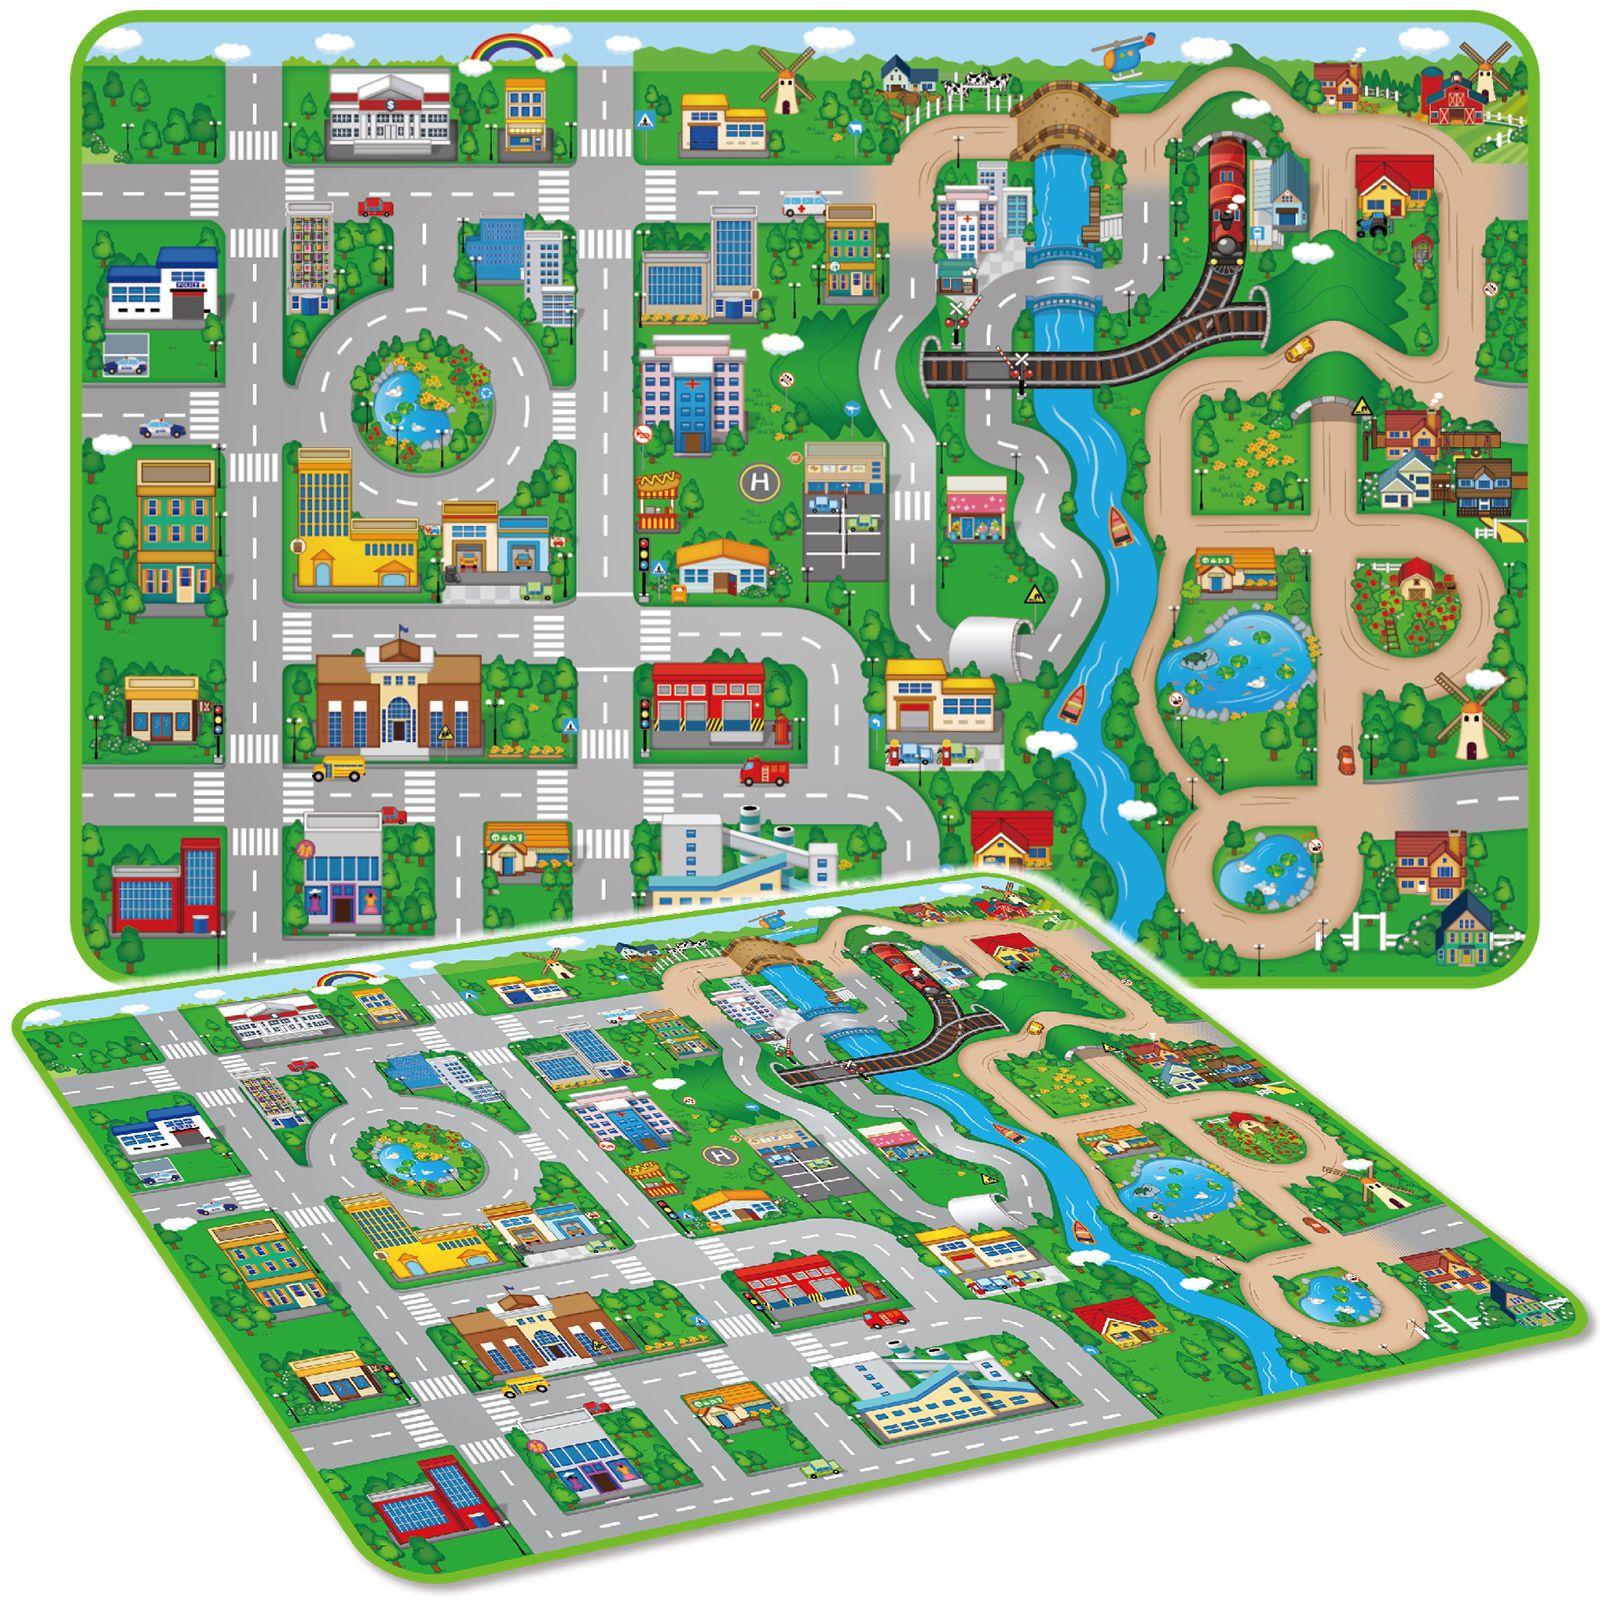 Giant Kids City Playmat Fun Town Cars Play Road Carpet Rug Eva Foam Toy Mat New Ebay